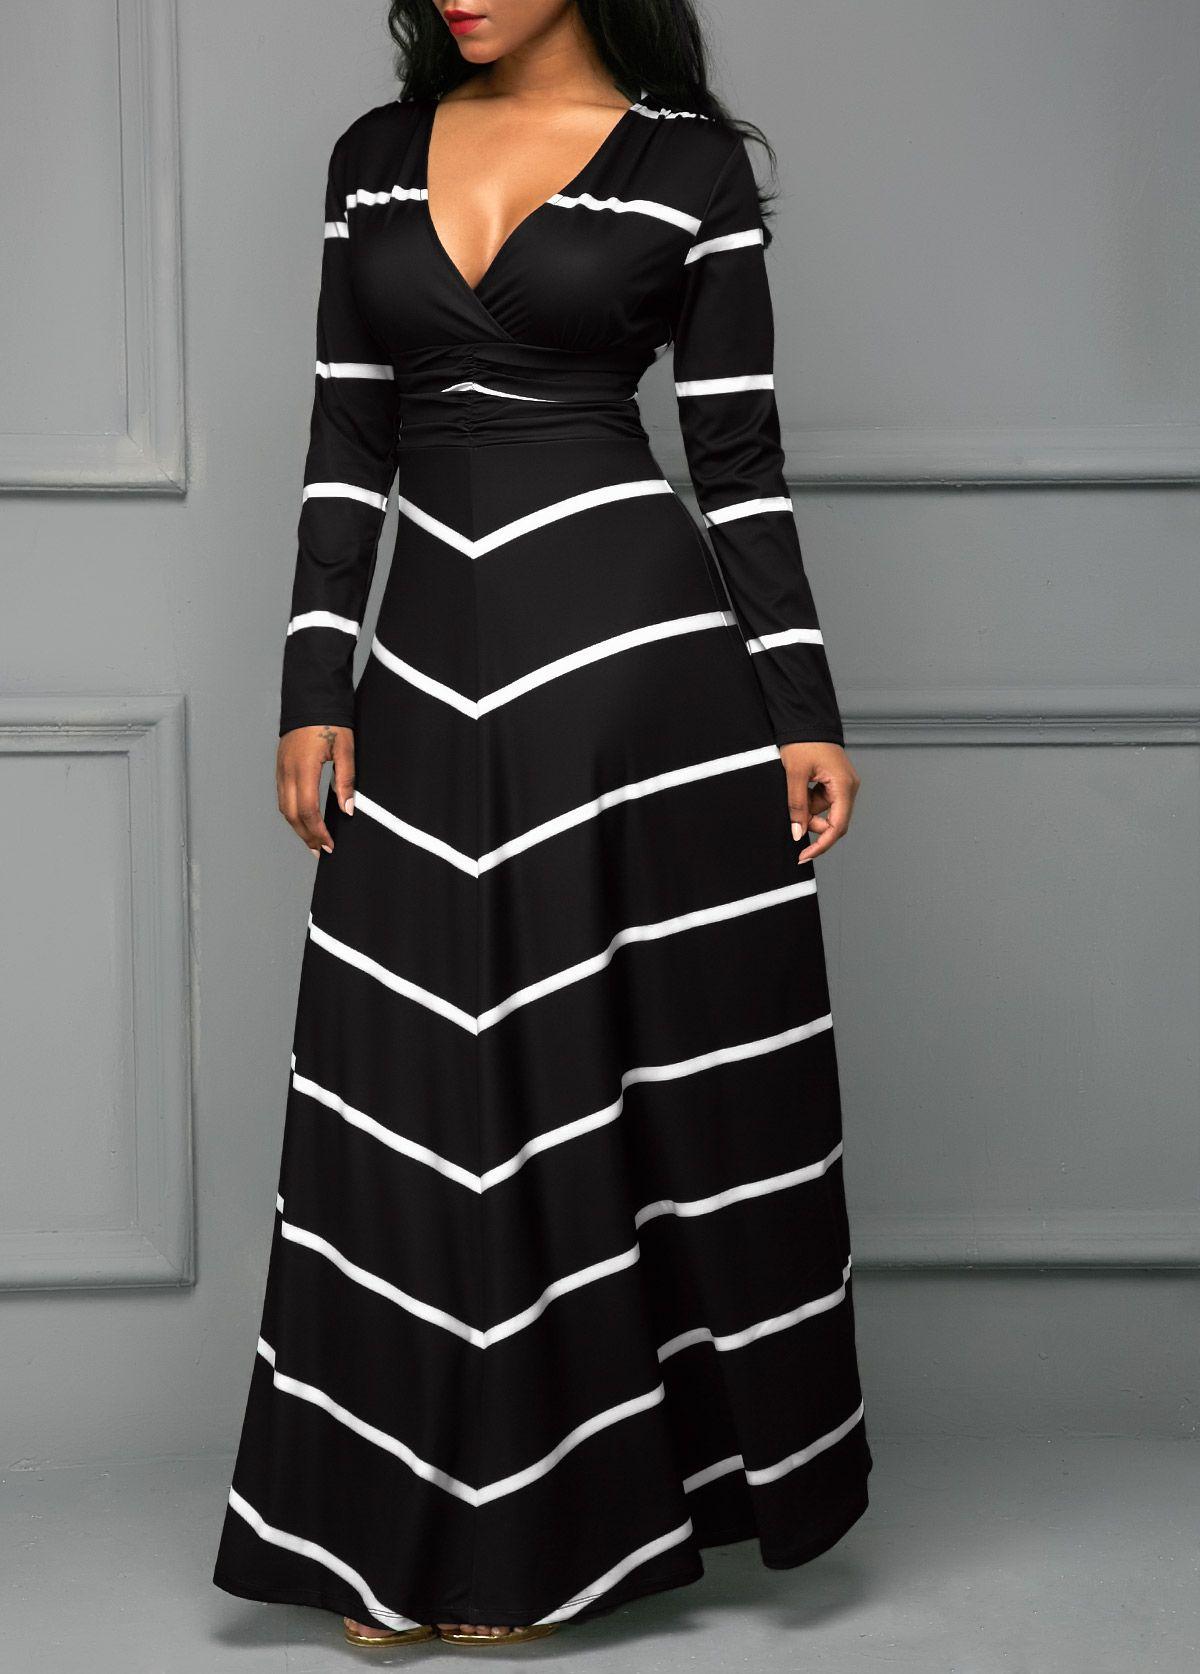 V Neck Long Sleeve Stripe Print Black Dress Rotita Com Usd 31 80 Striped Print Dresses Women S Fashion Dresses Fashion [ 1674 x 1200 Pixel ]